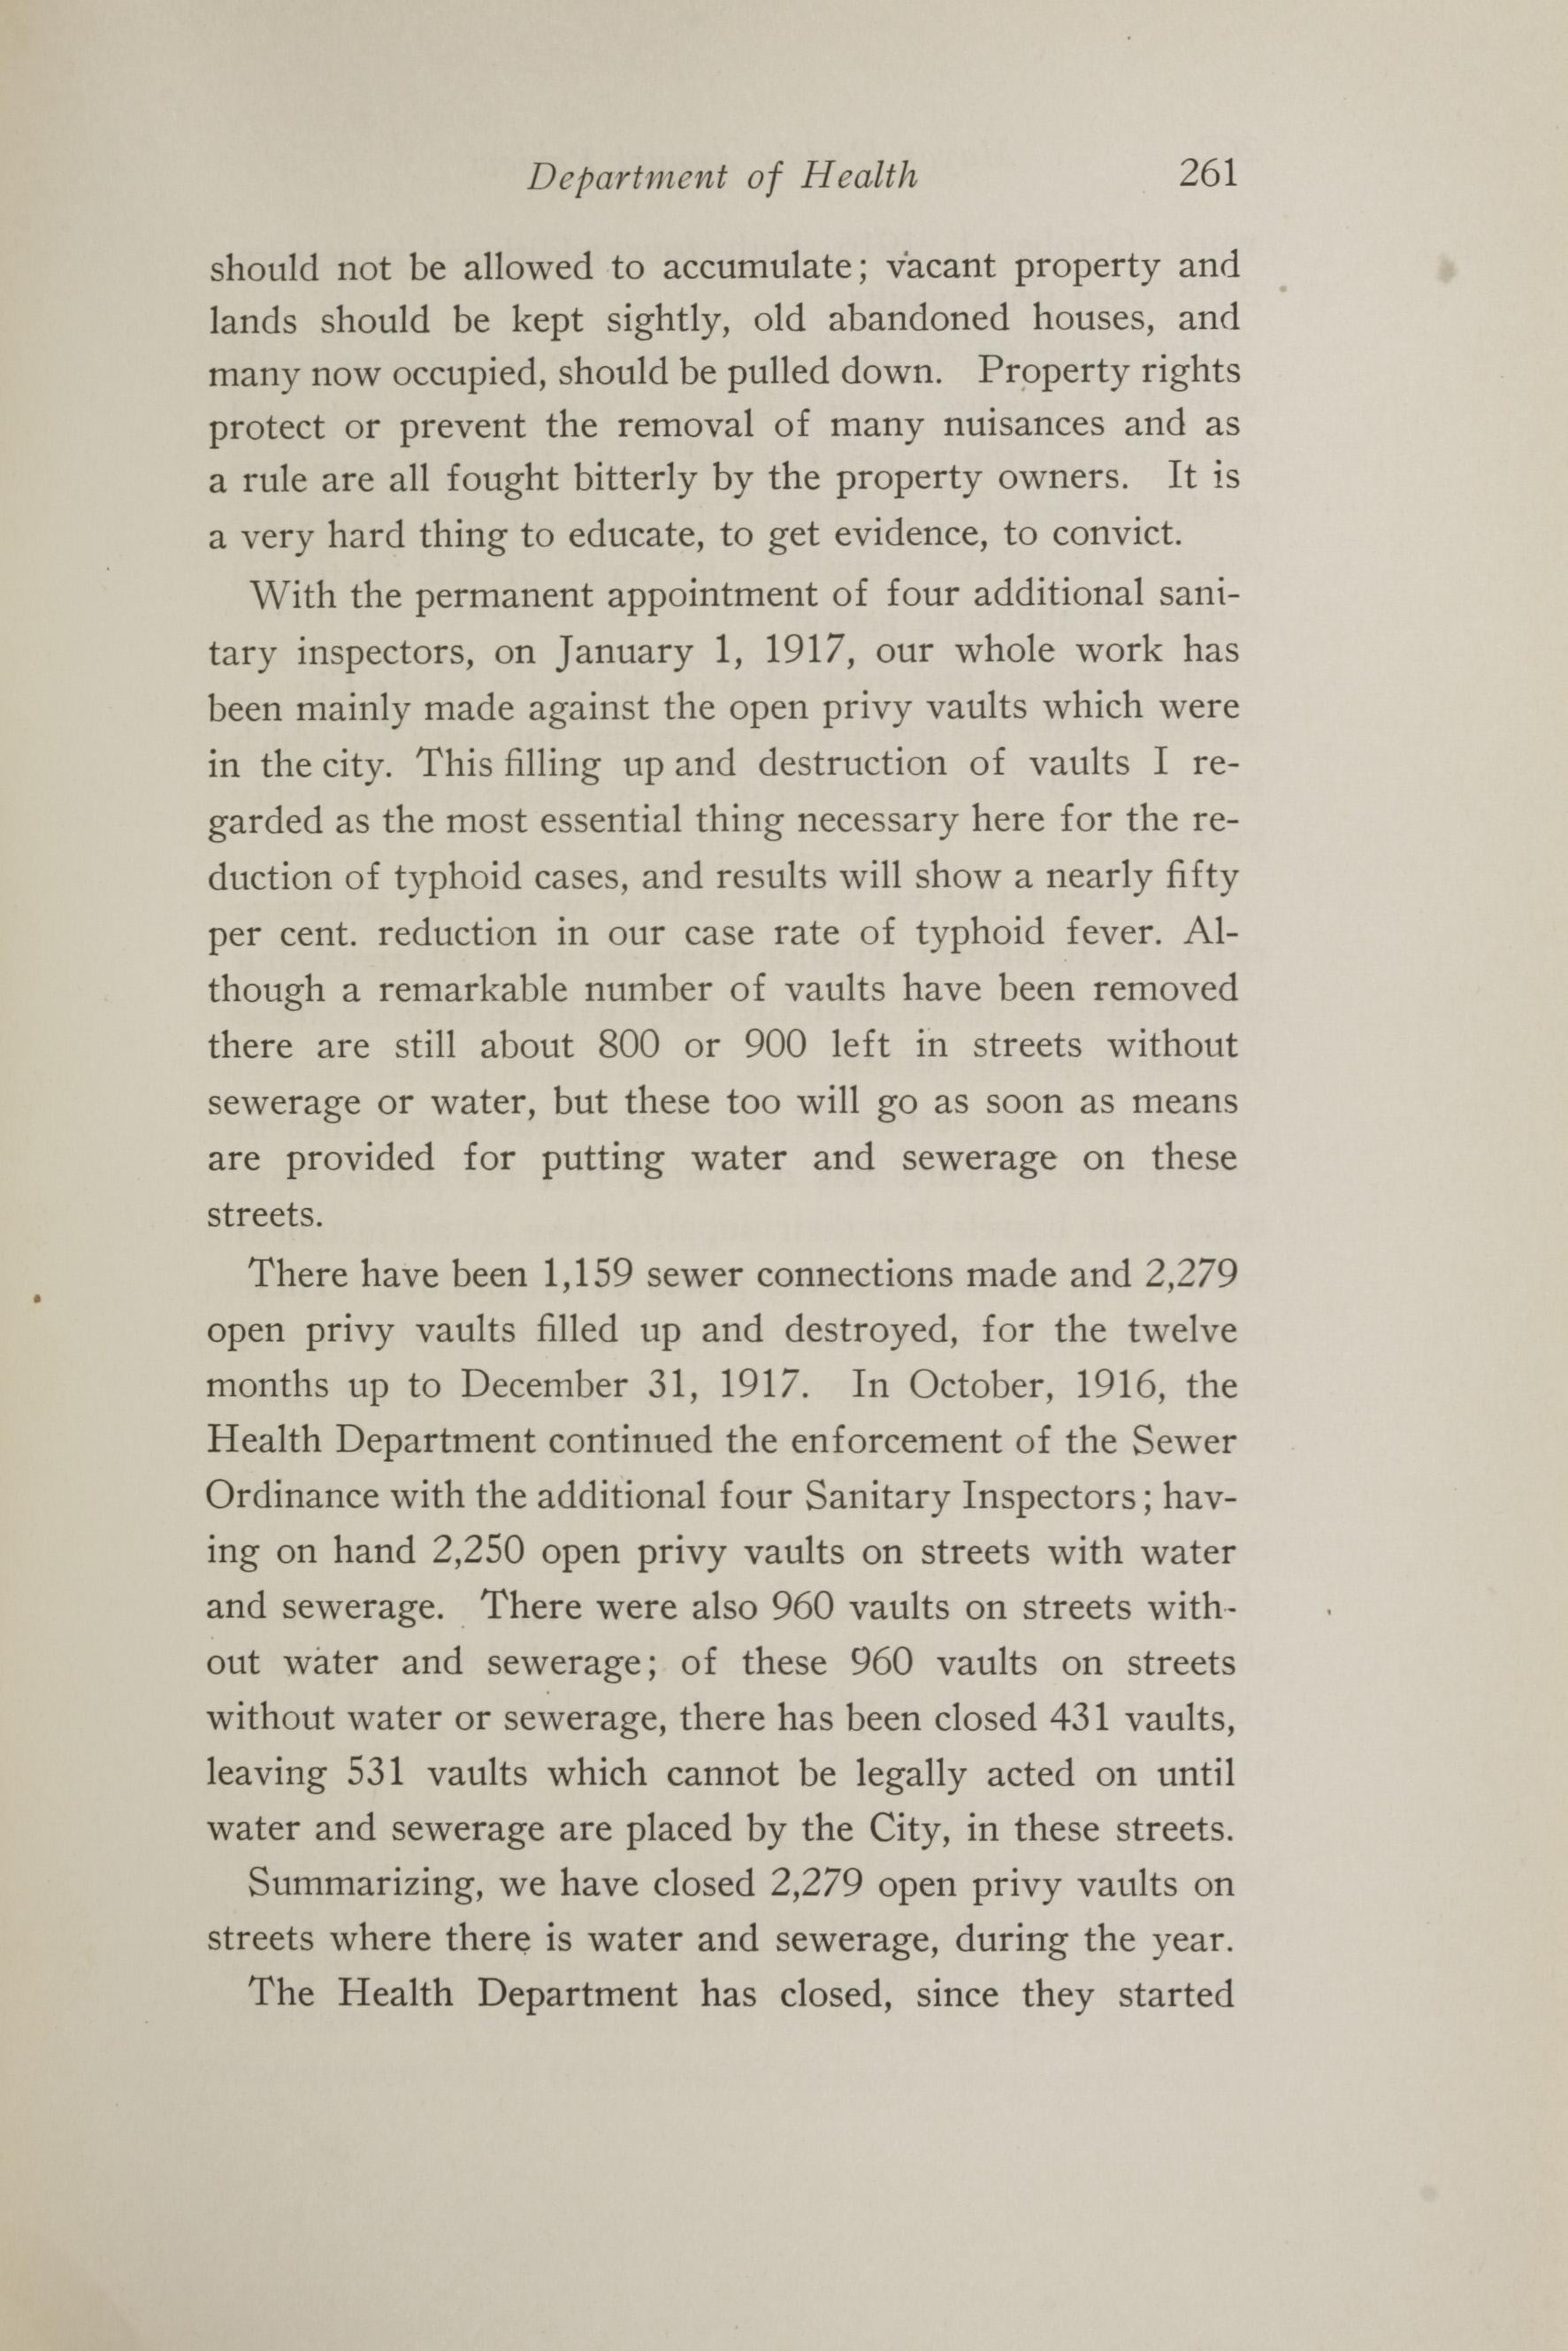 Charleston Yearbook, 1917, page 261